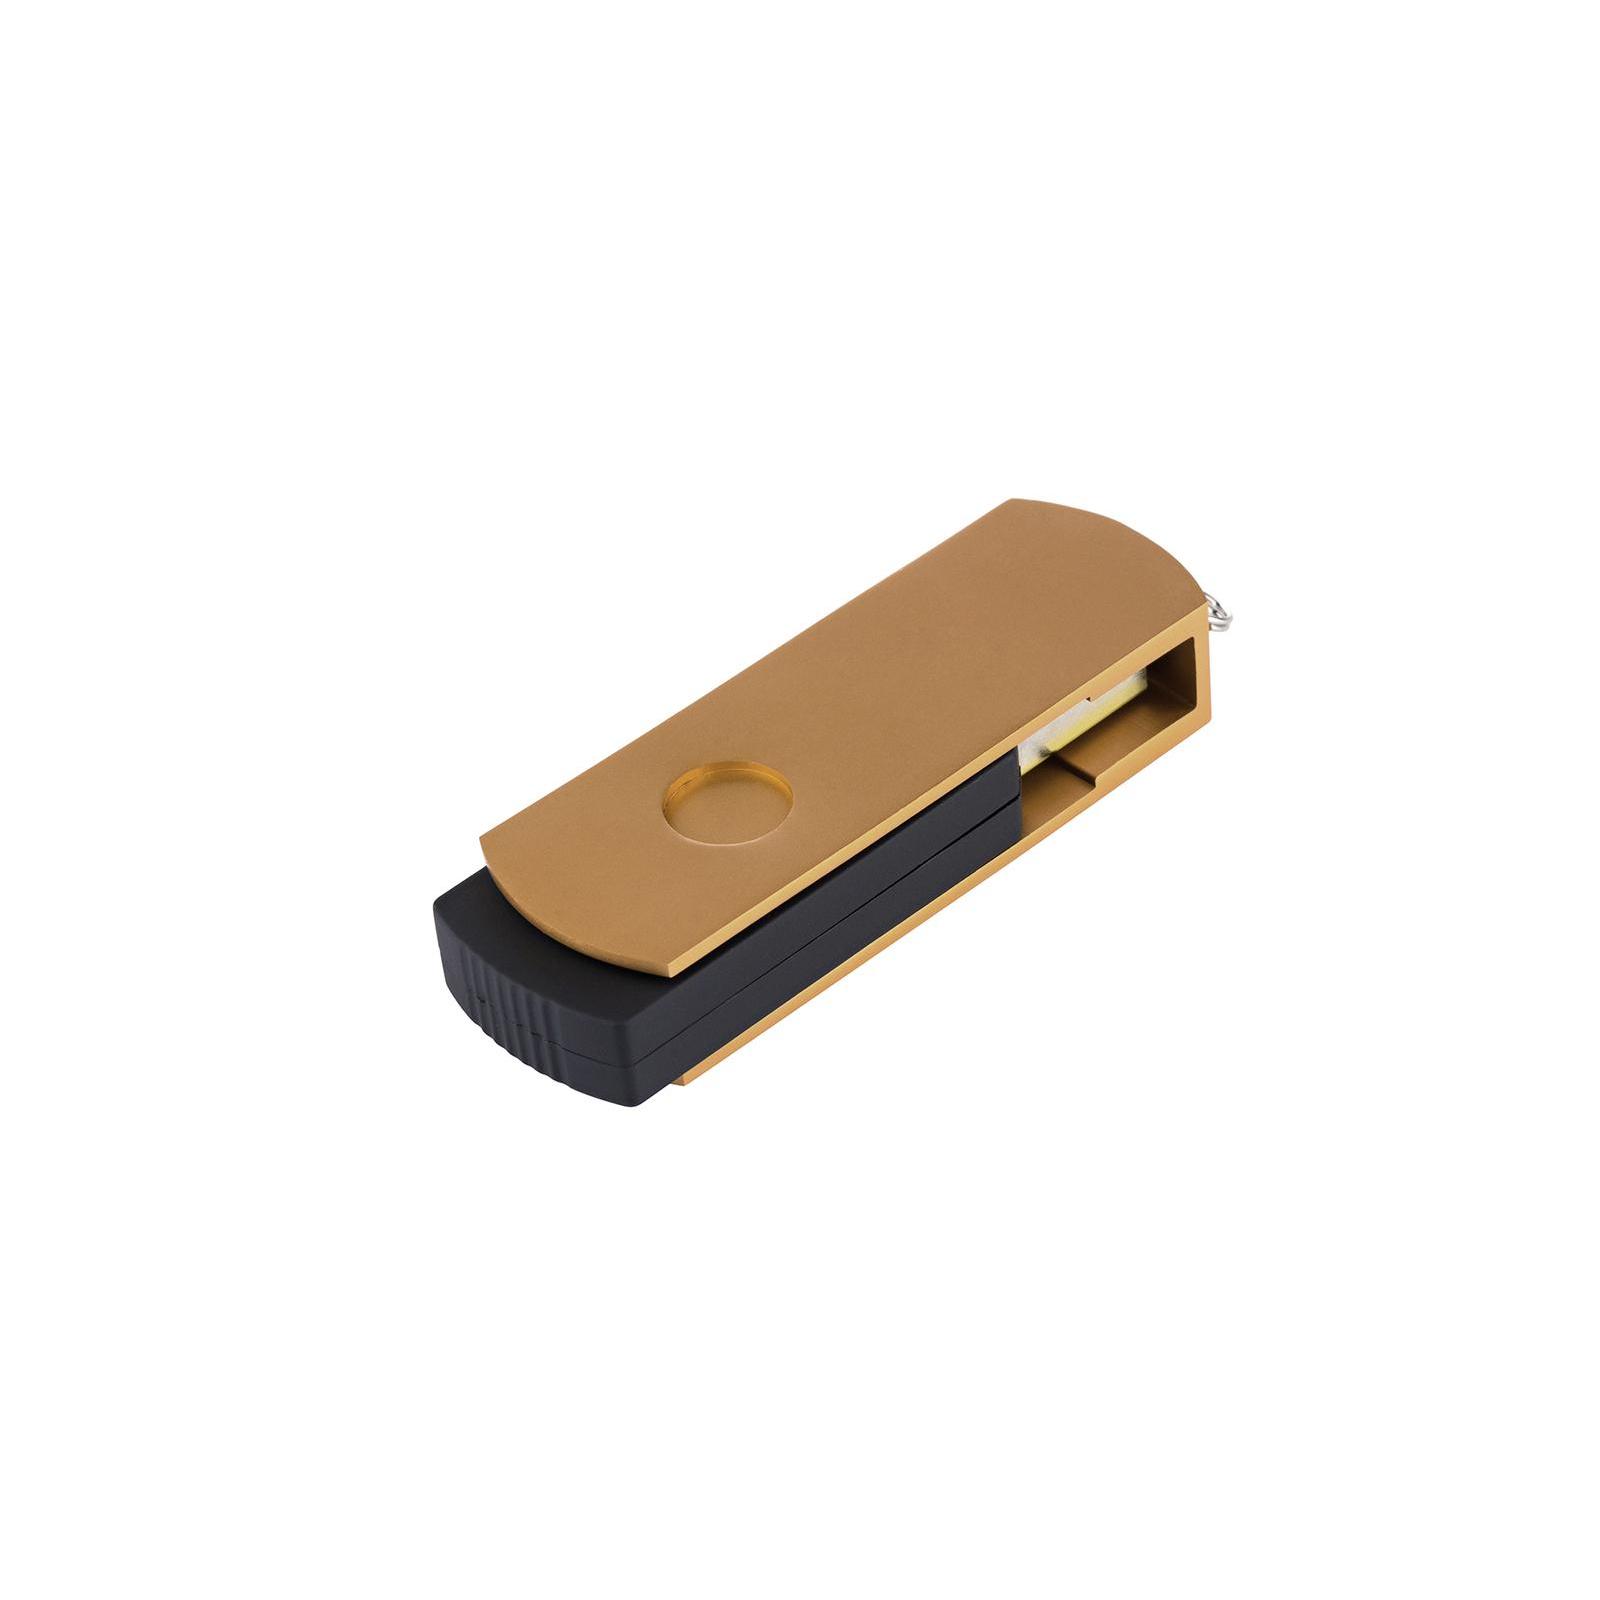 USB флеш накопитель eXceleram 64GB P2 Series Yellow2/Black USB 2.0 (EXP2U2Y2B64) изображение 6